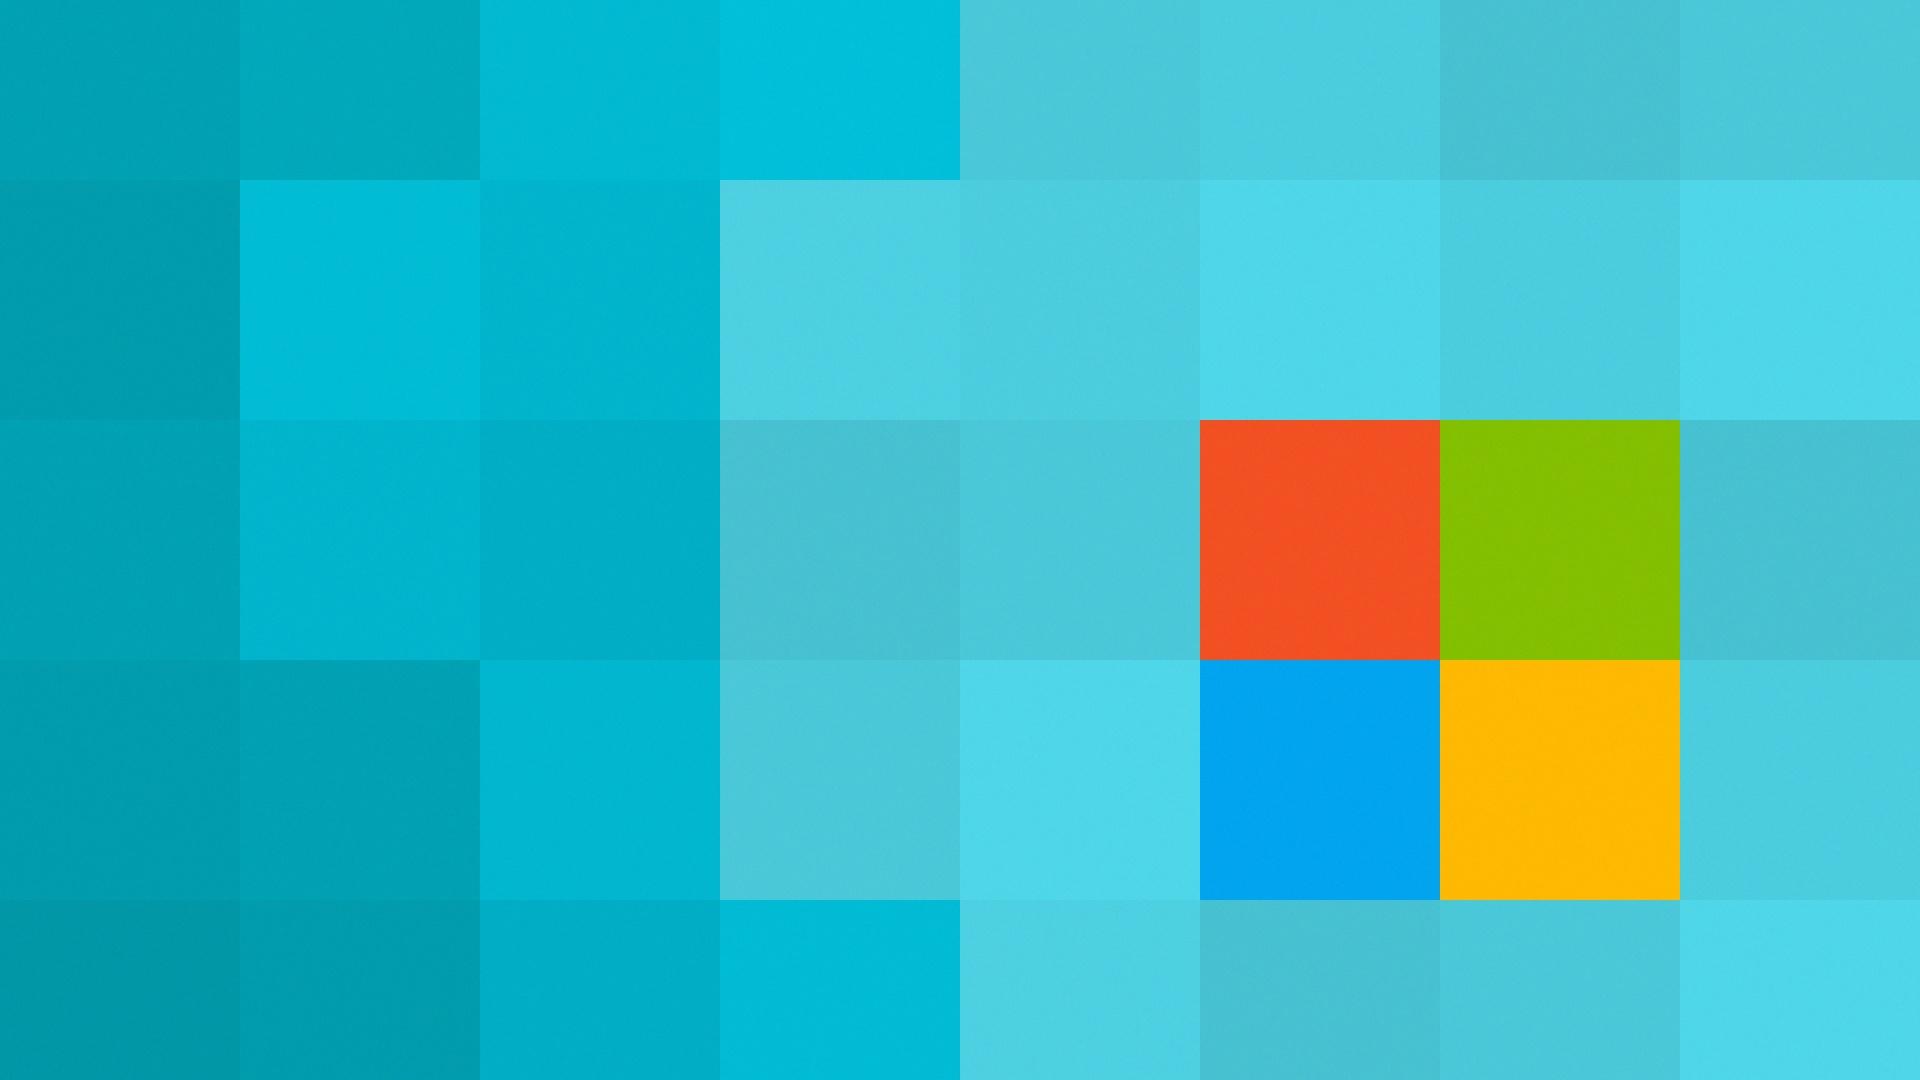 Windows 10 Logo Wallpaper 1920x1080 Wallpapersafari